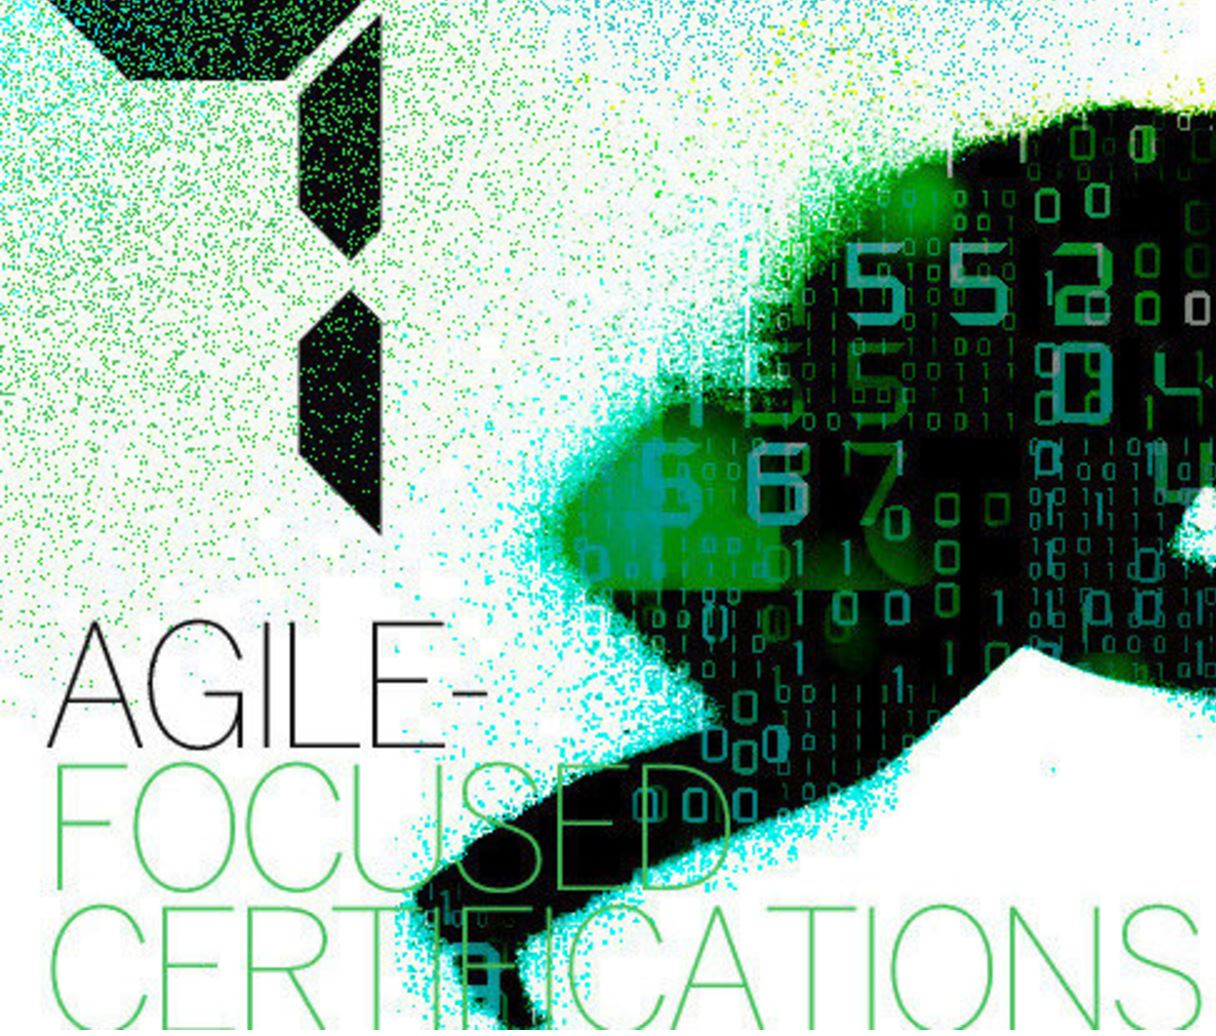 7agile-certifications.jpg